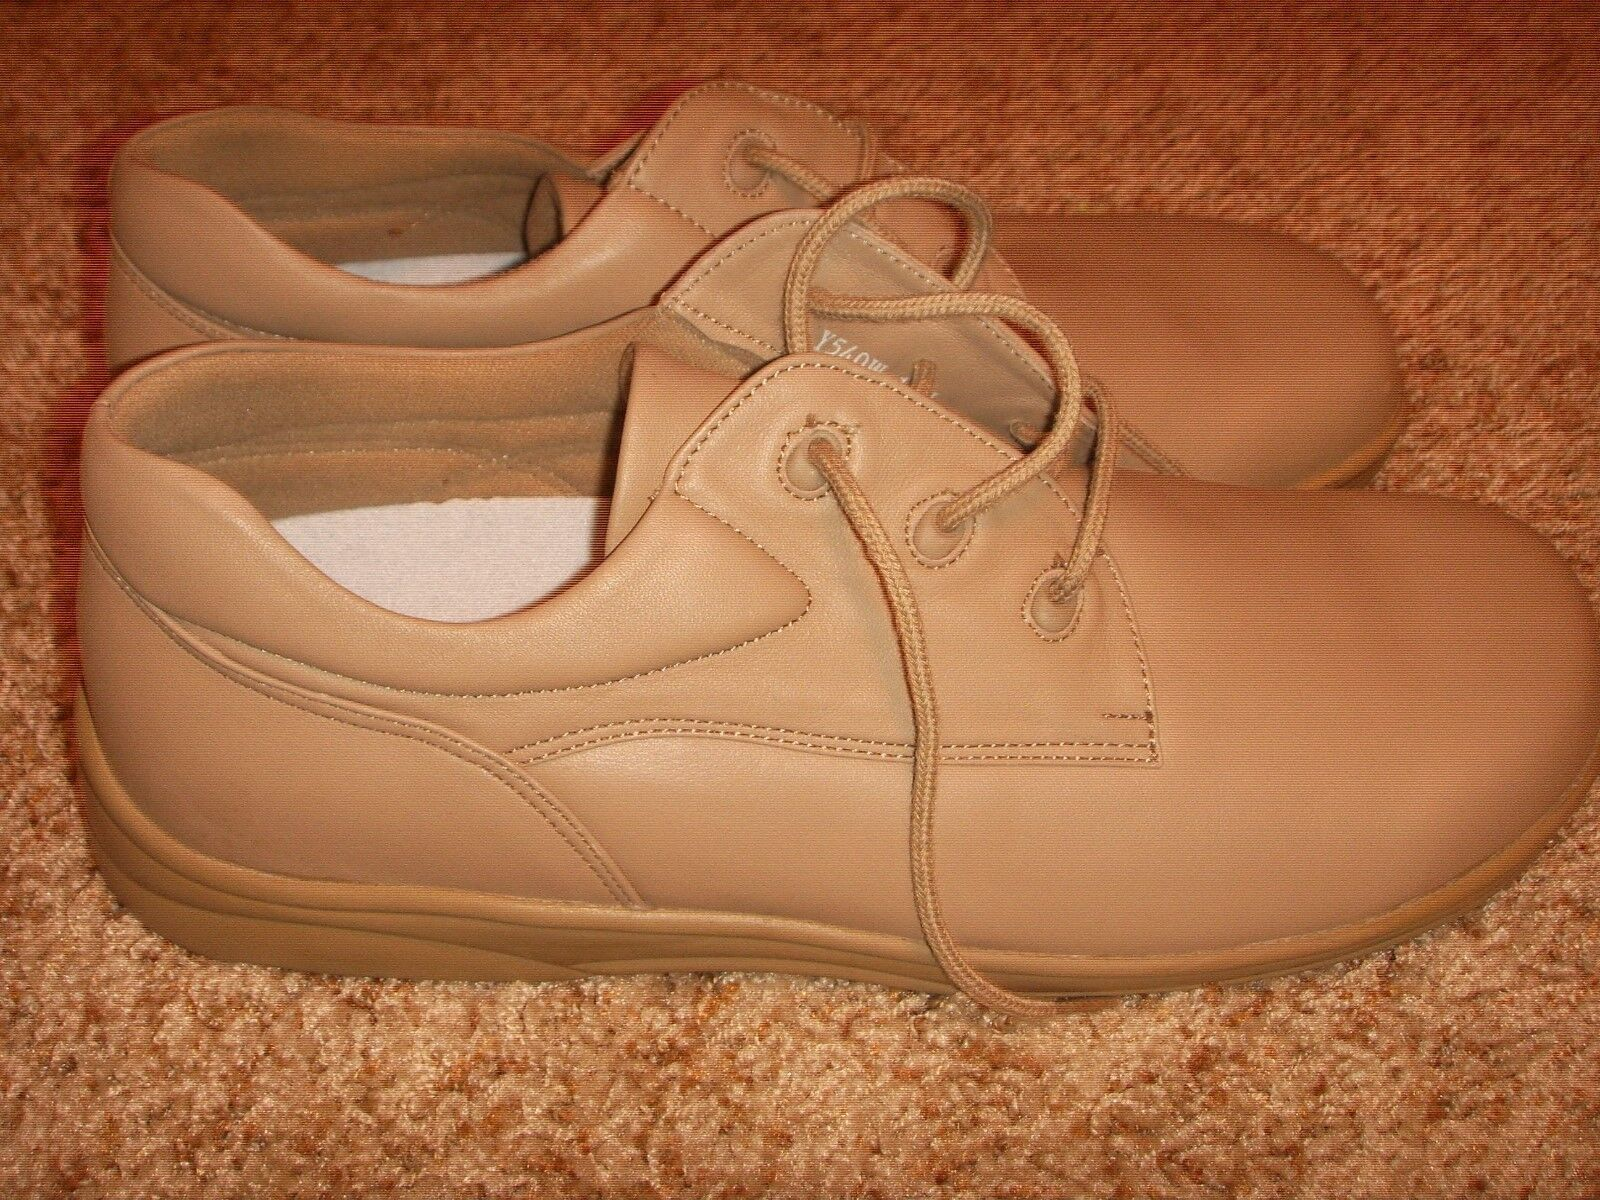 Baronoir femme chaussures Outdoor femmes Pour chaussures